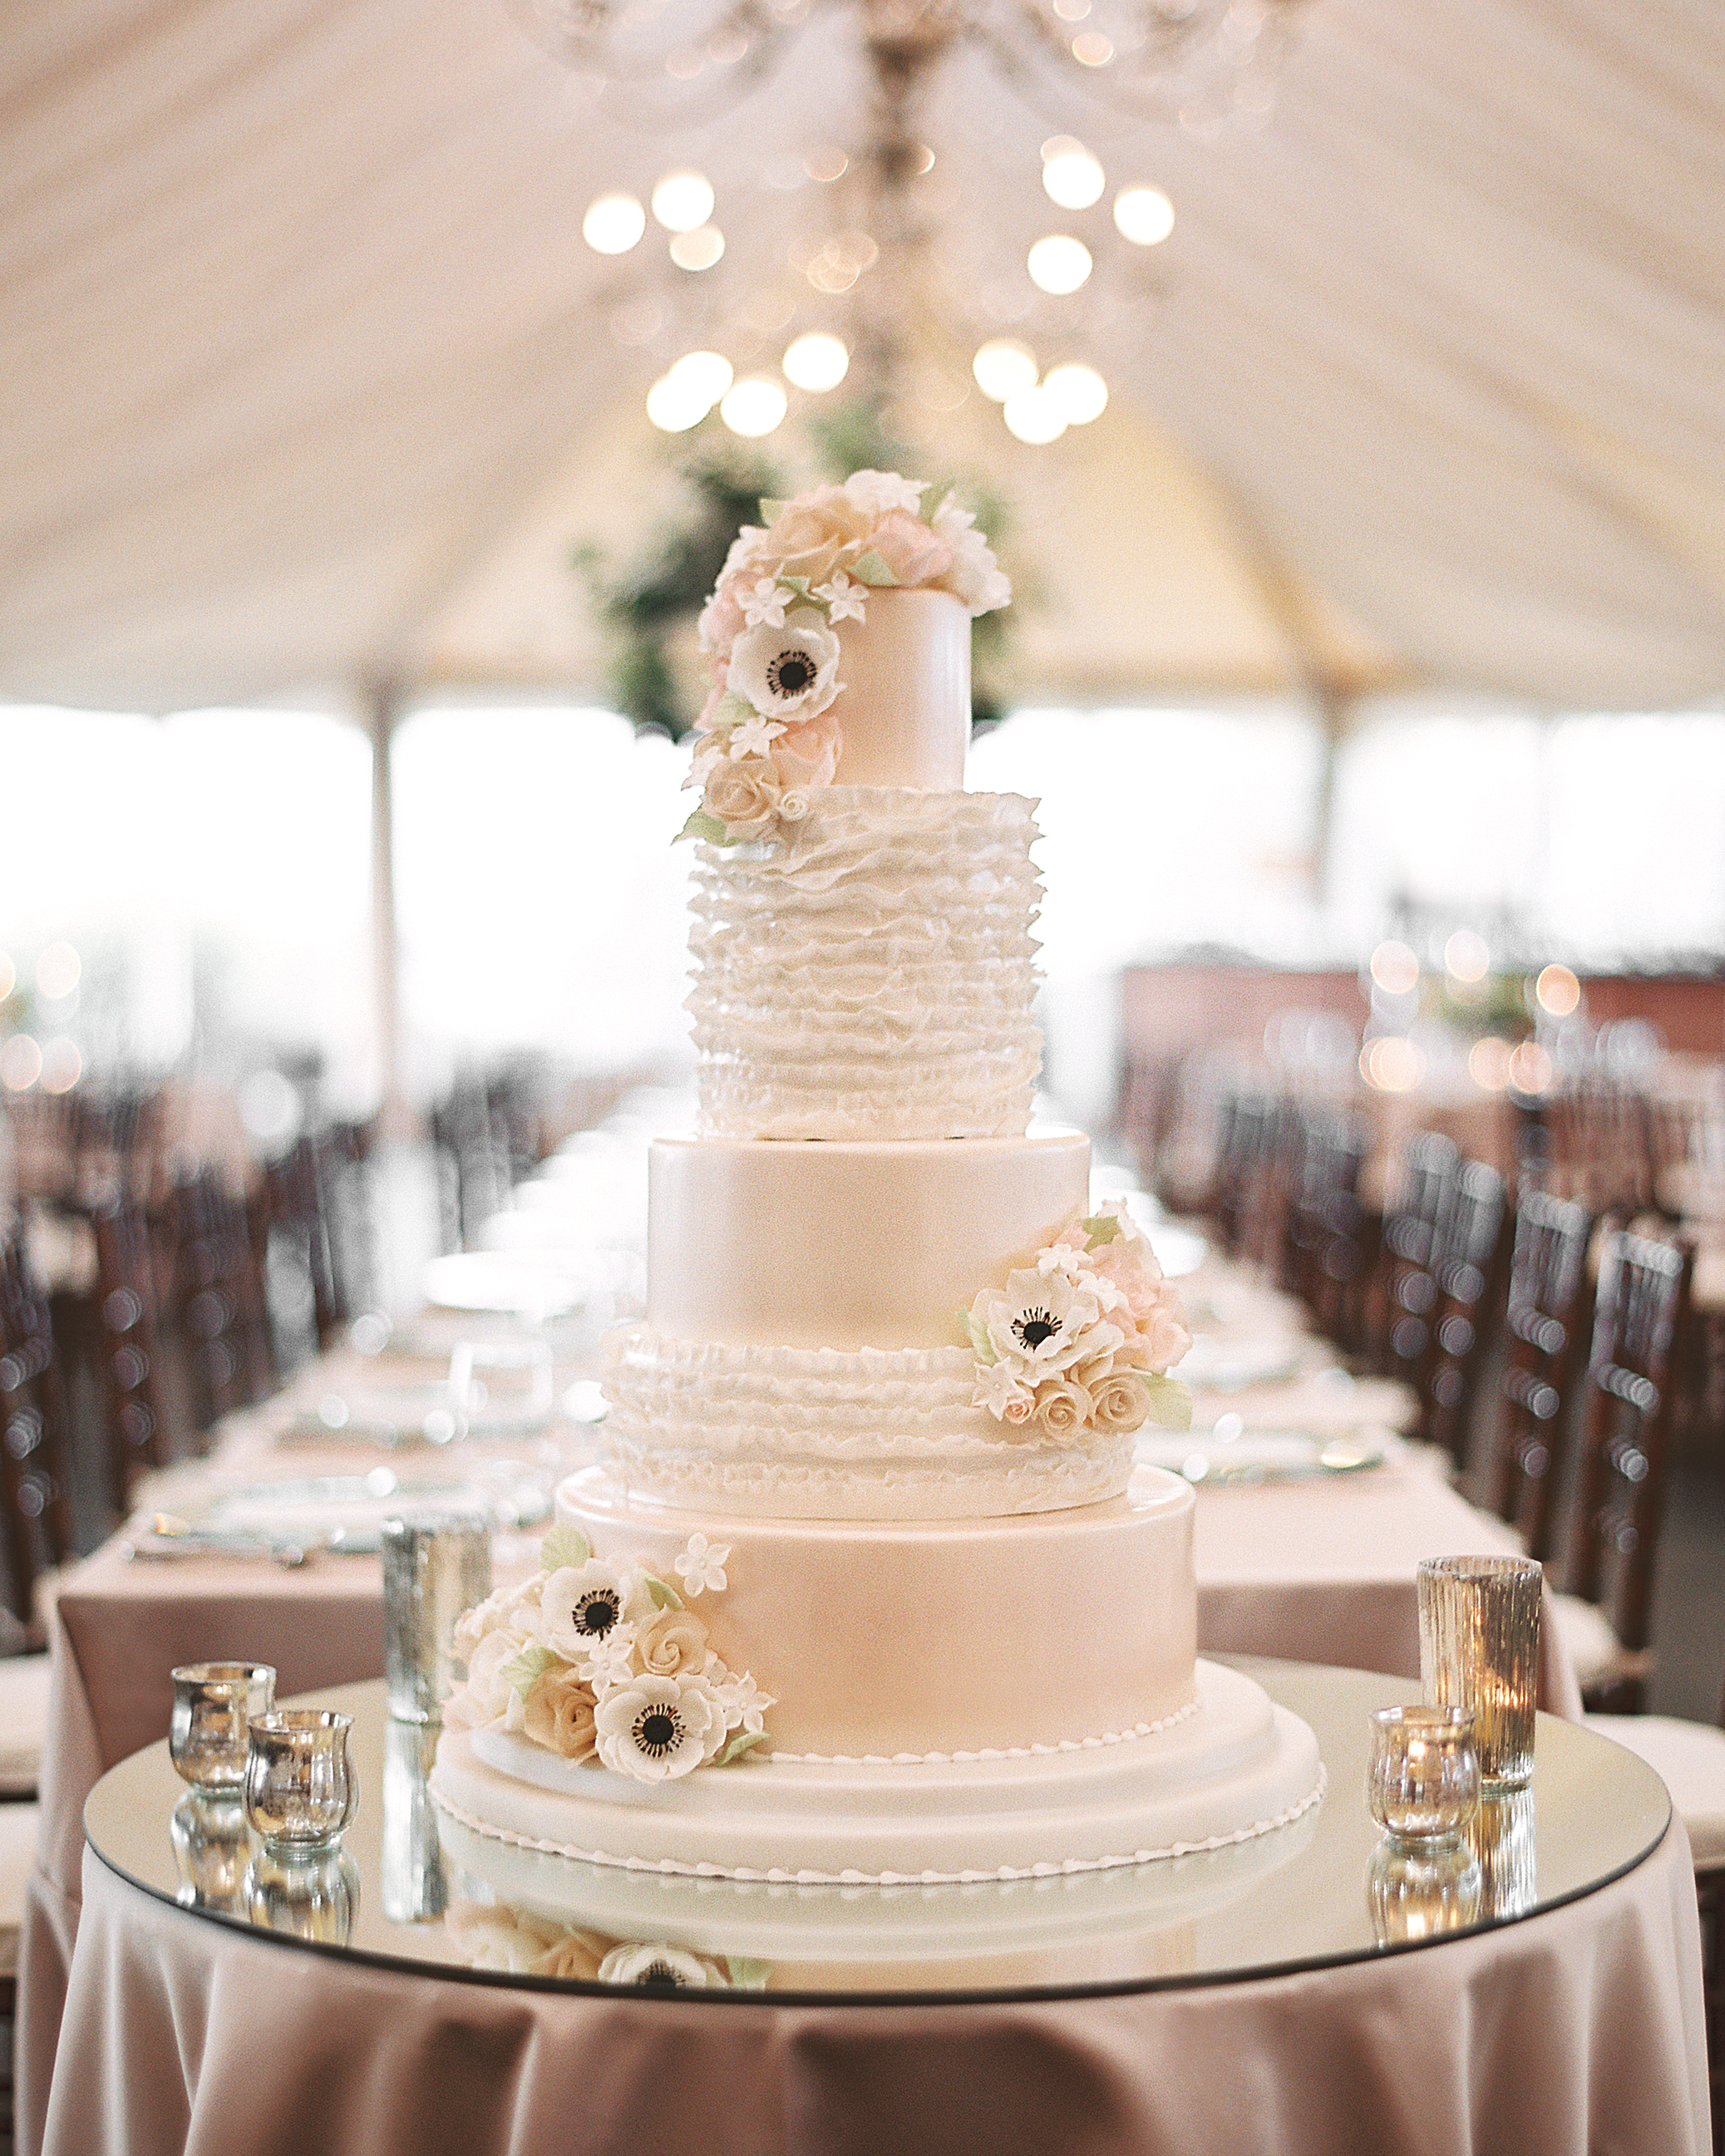 wedding-cake-dsc-393-mwds110870.jpg